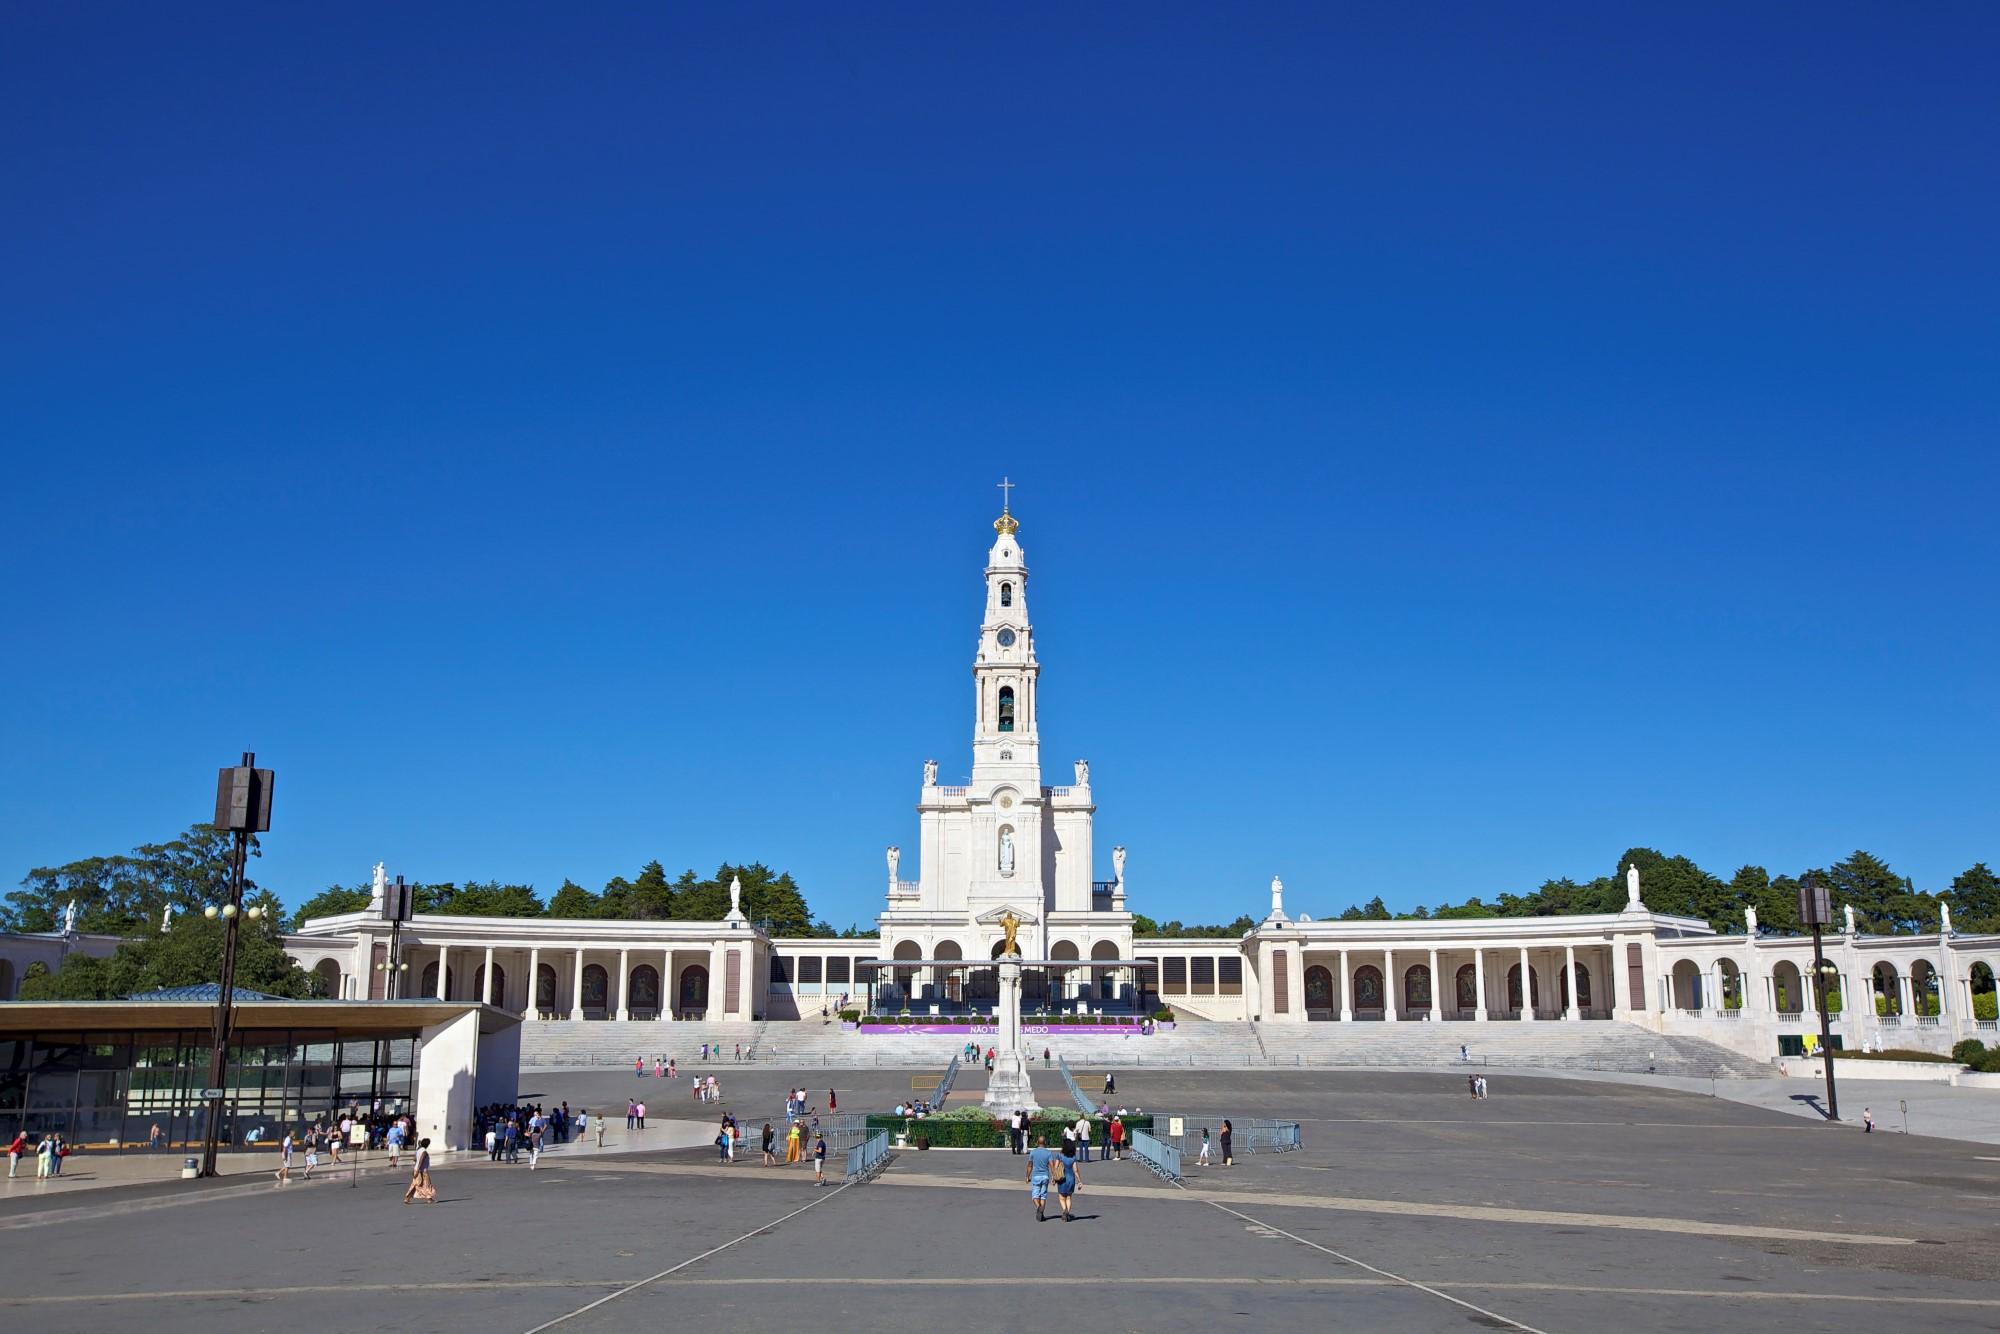 Fatima Portugal City Tour